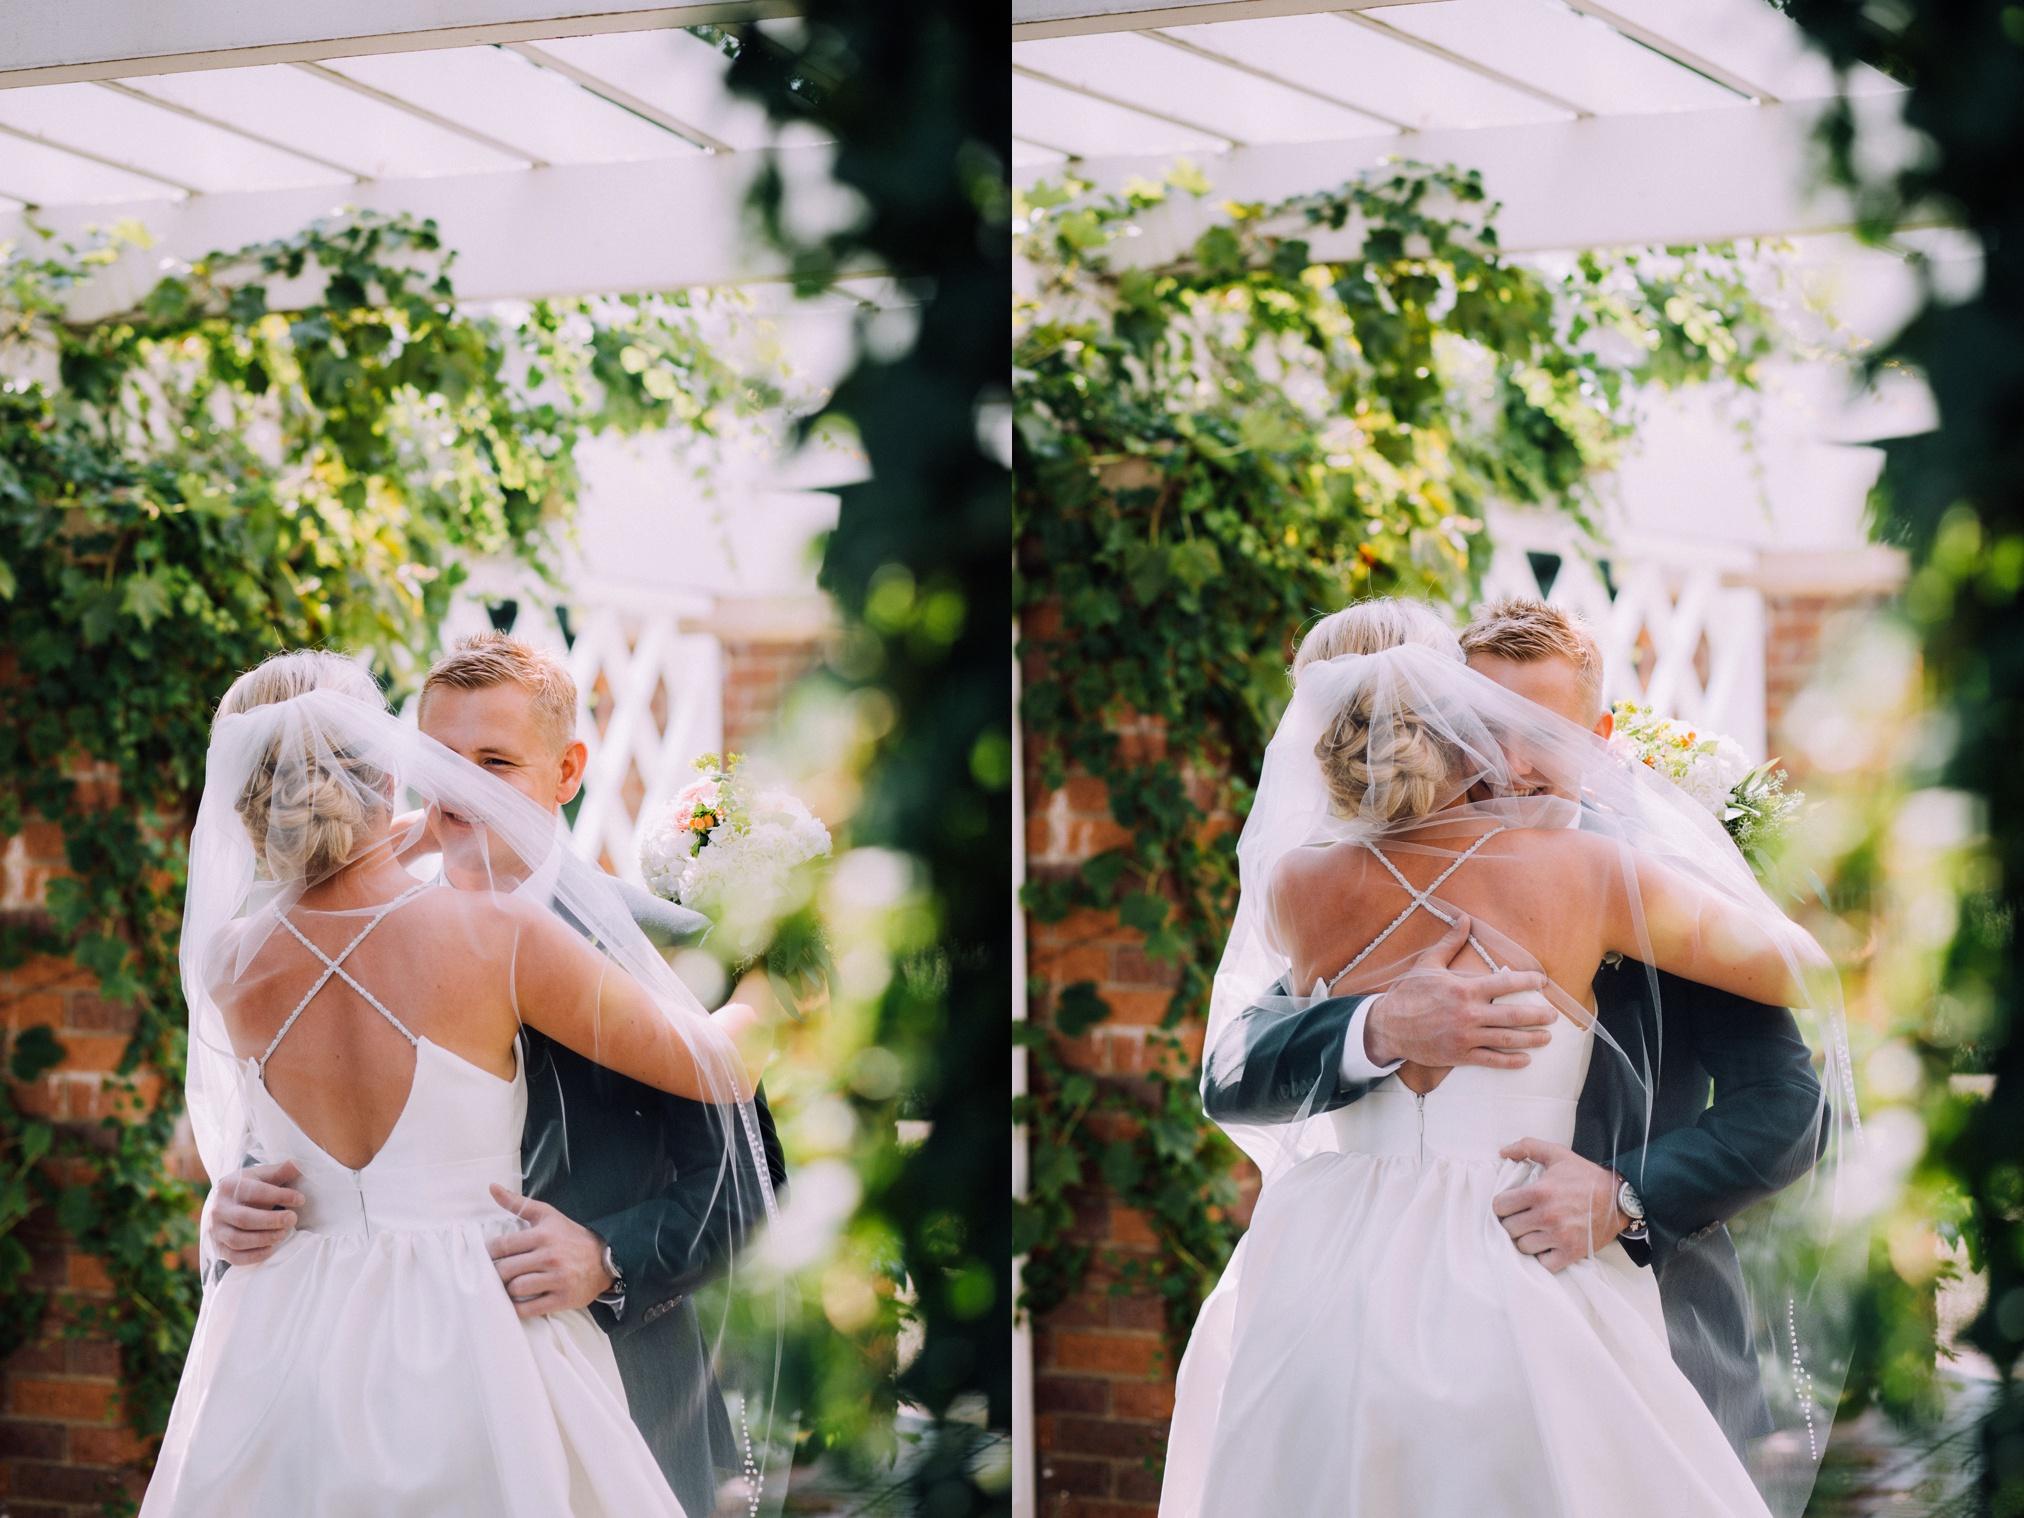 brenna+michael_wedding-251.jpg